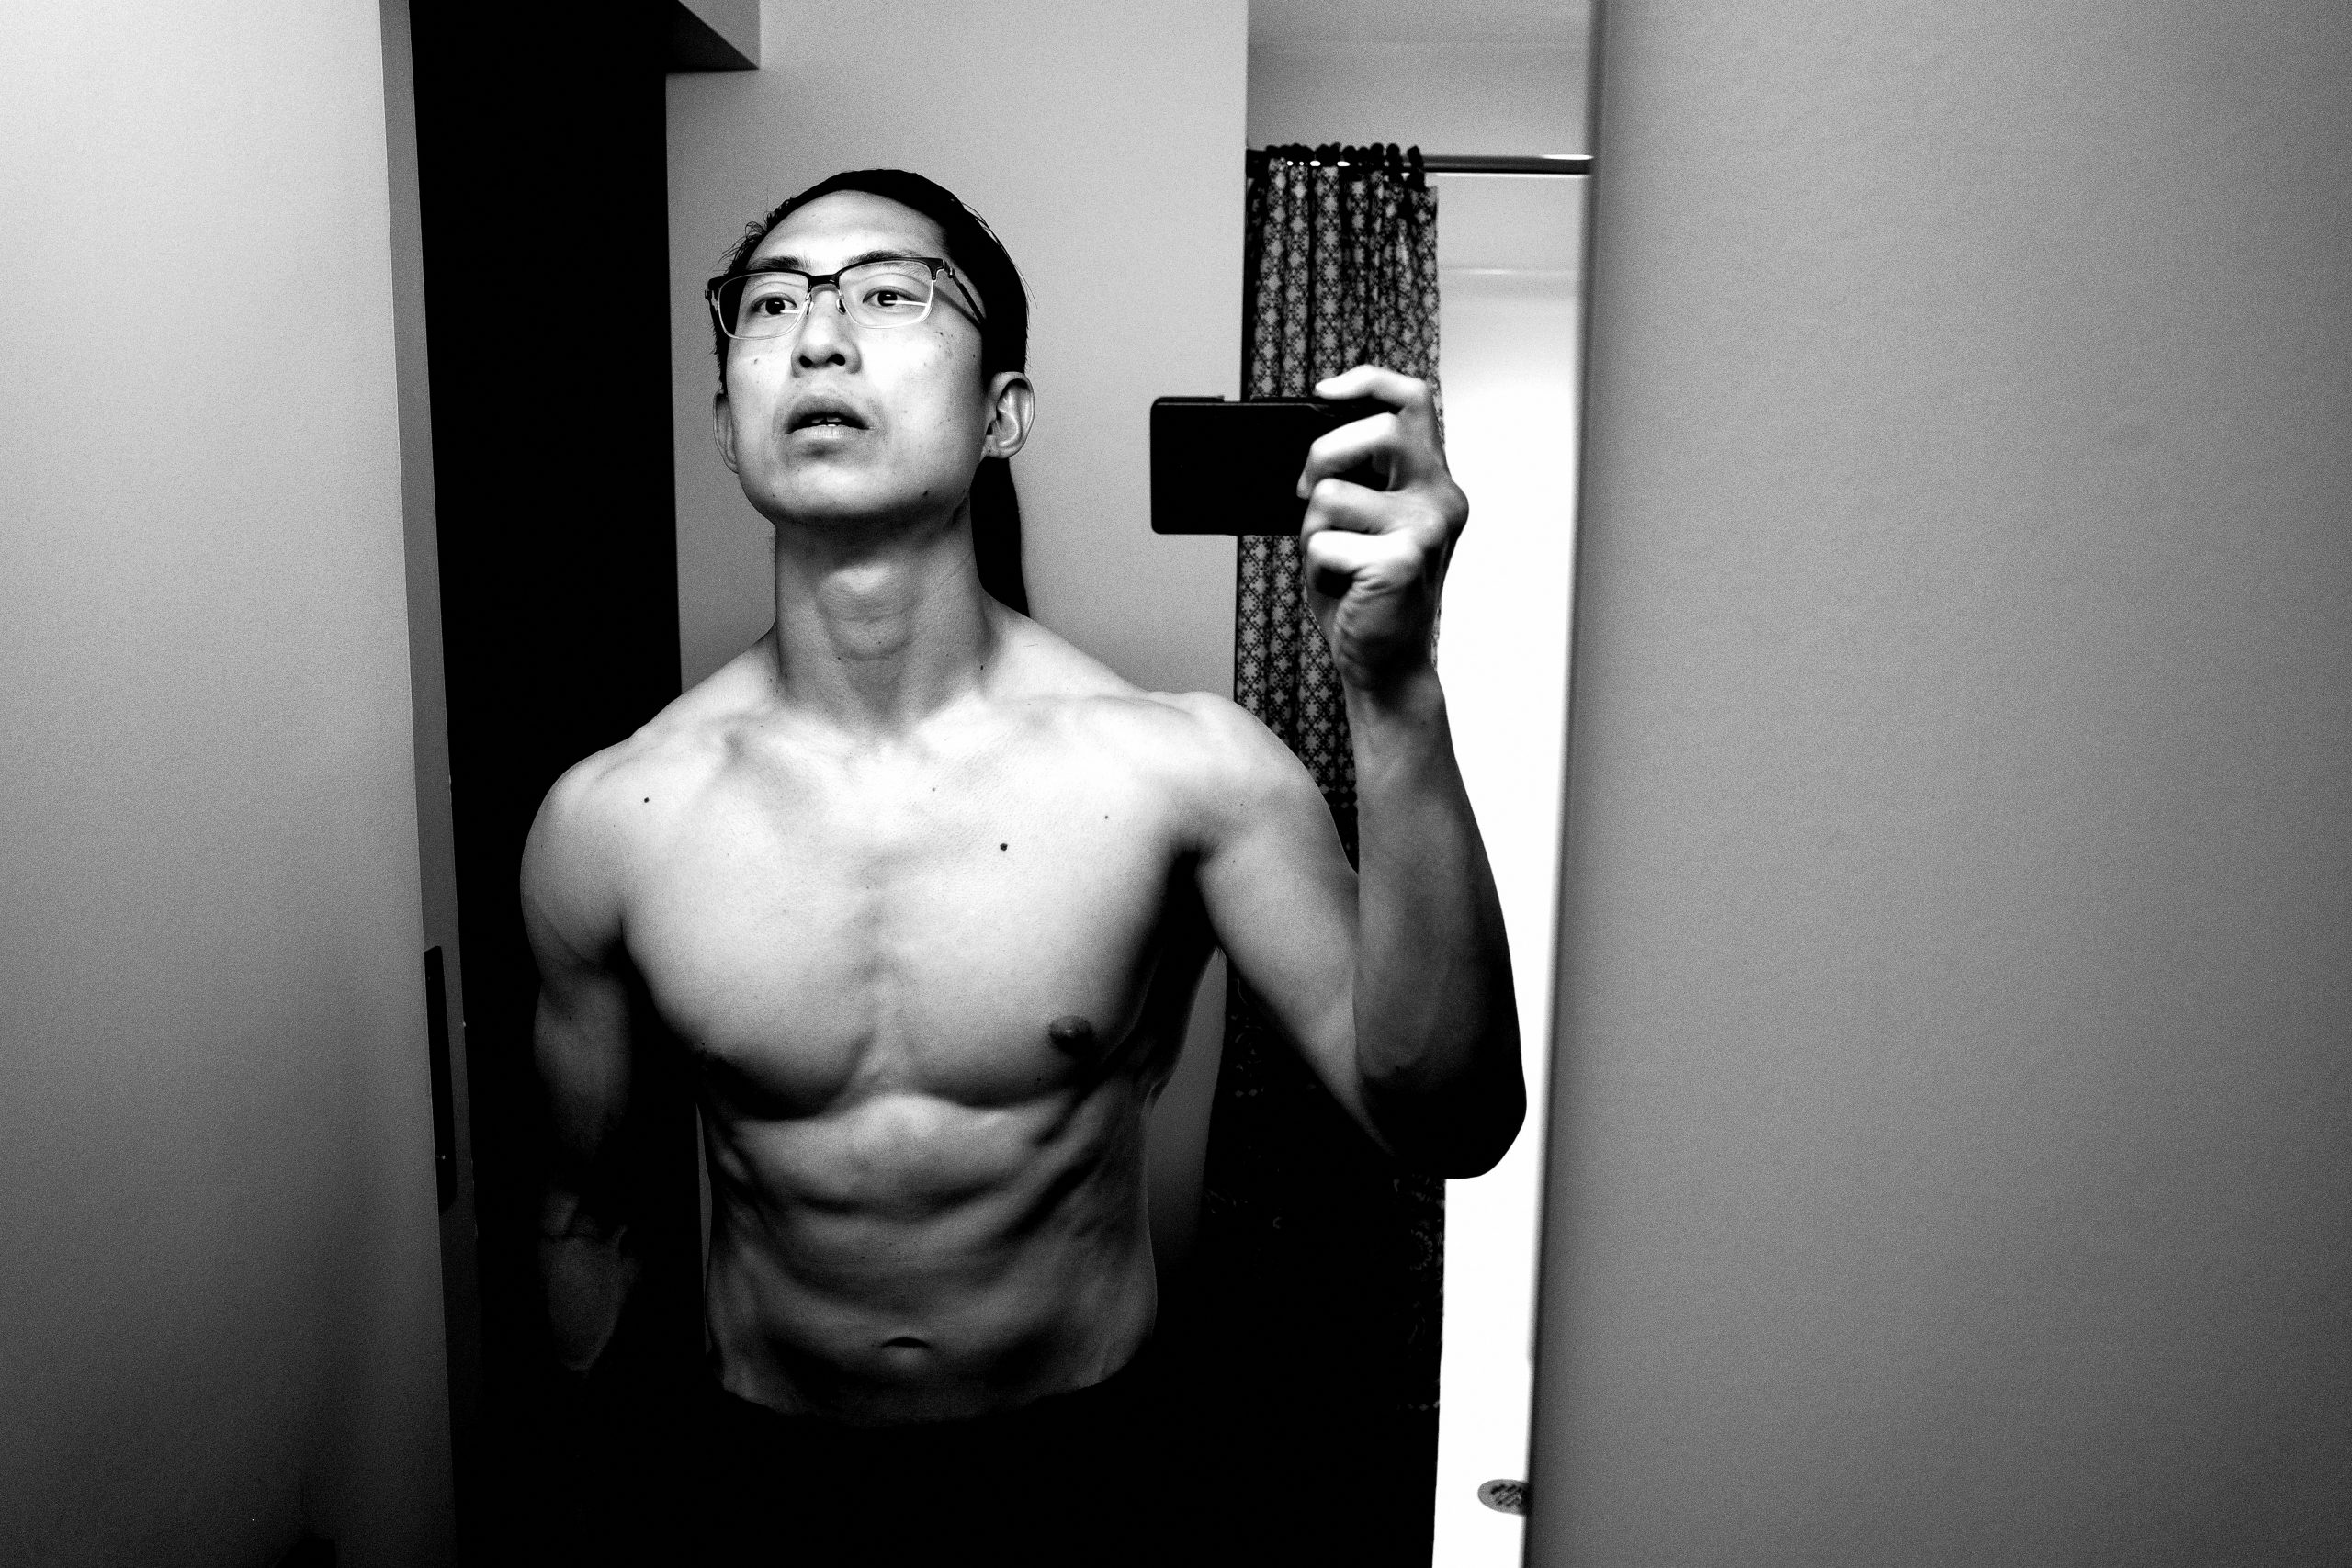 Selfie muscle